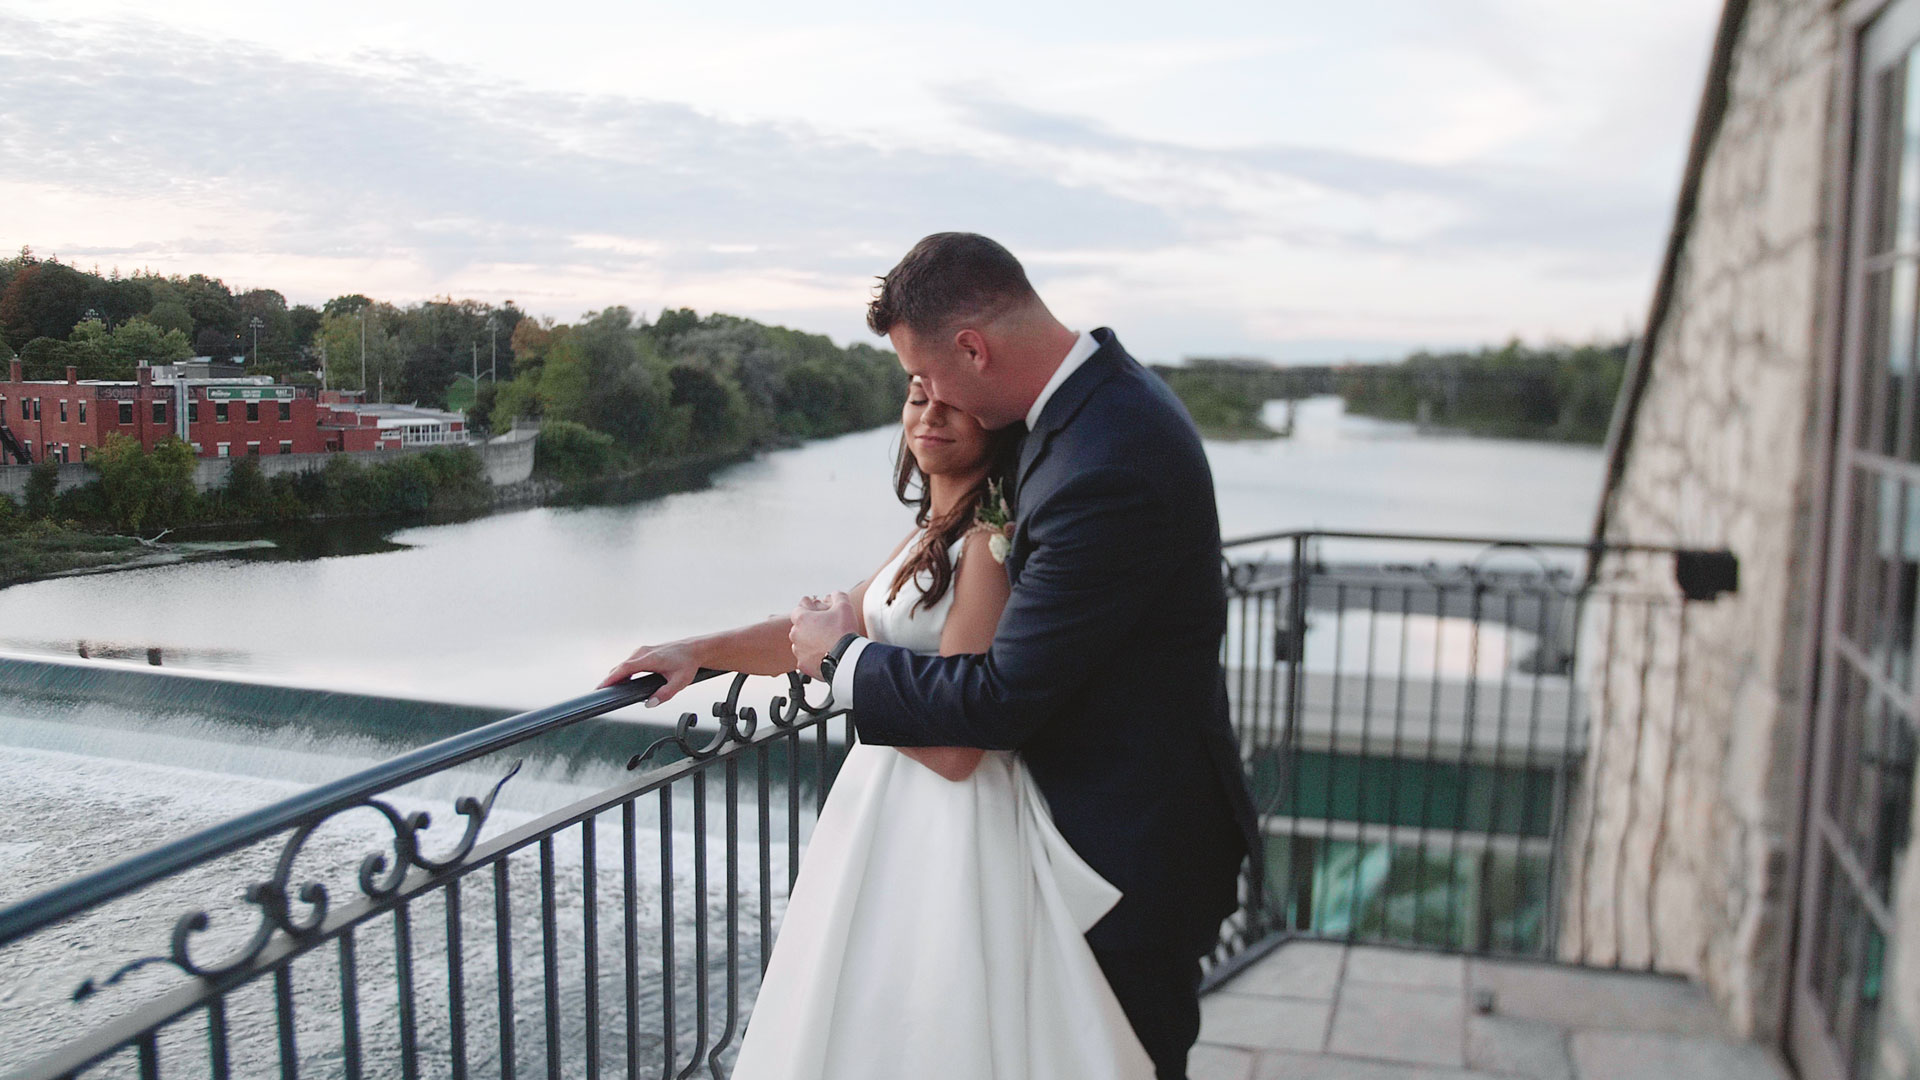 Cambridge Mill Wedding Videography | Alicja + Martin 1